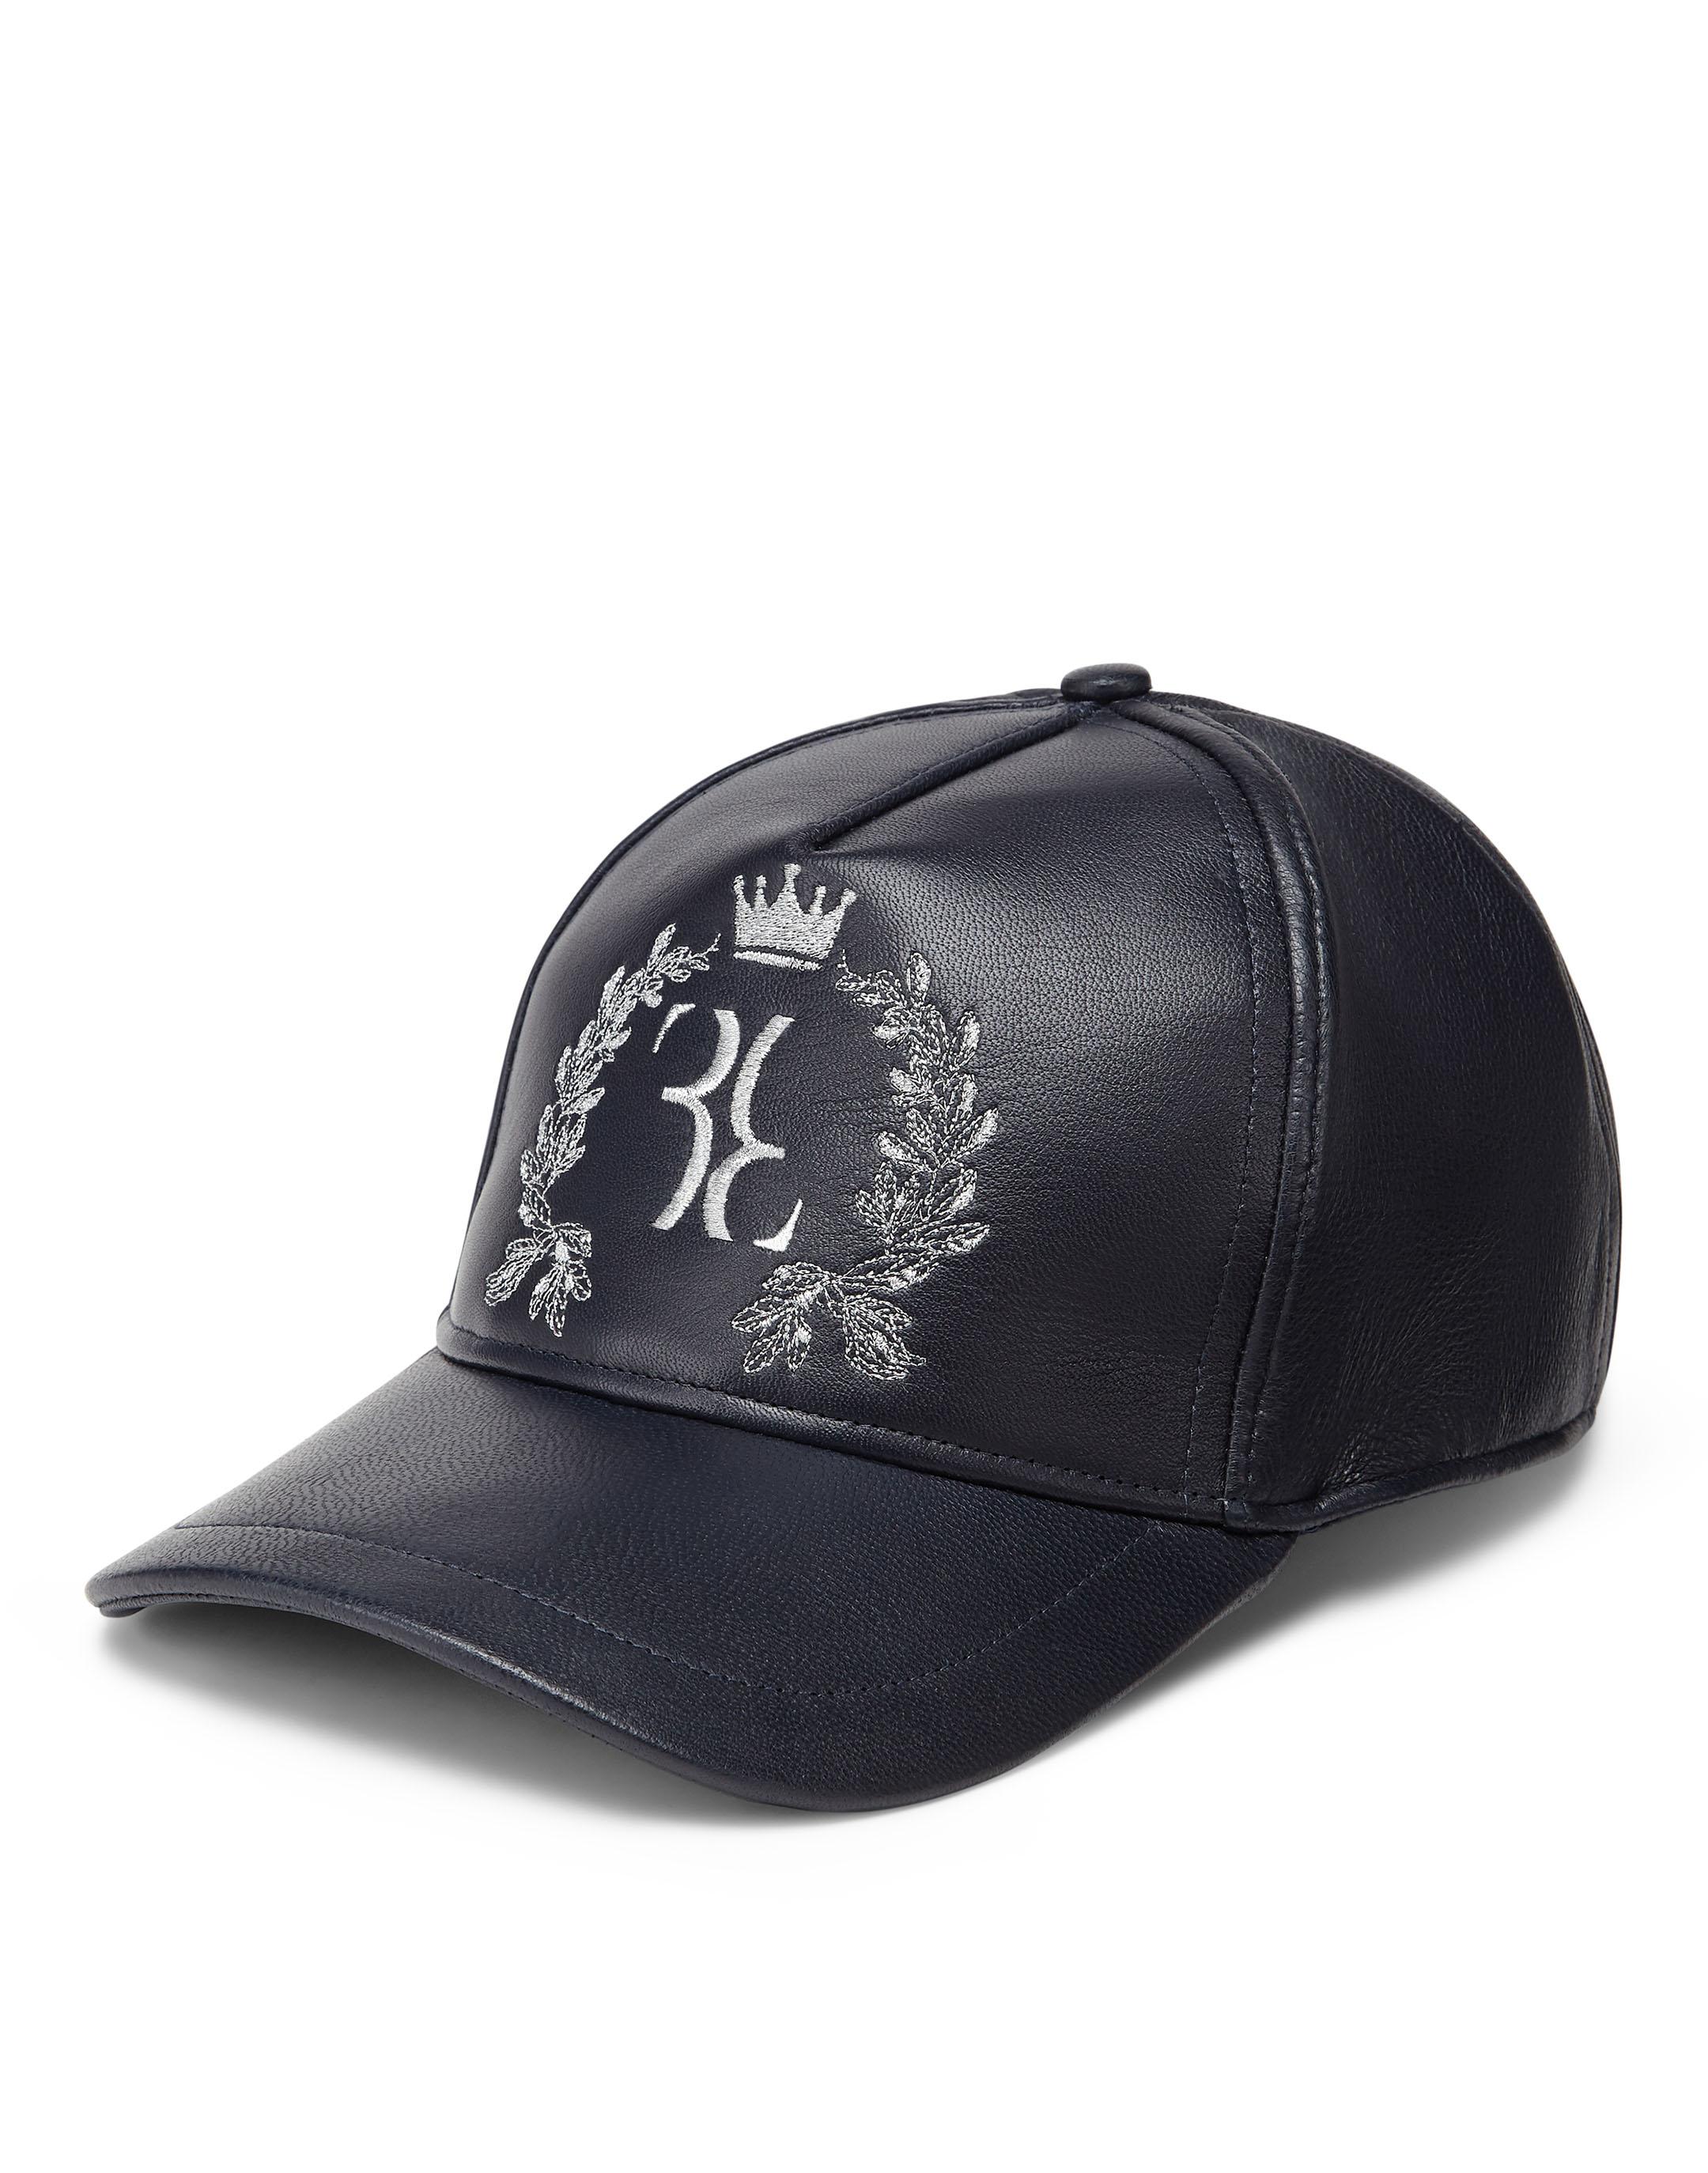 Visor Hat Baroque Double B Billionaire   Sale   E shop China